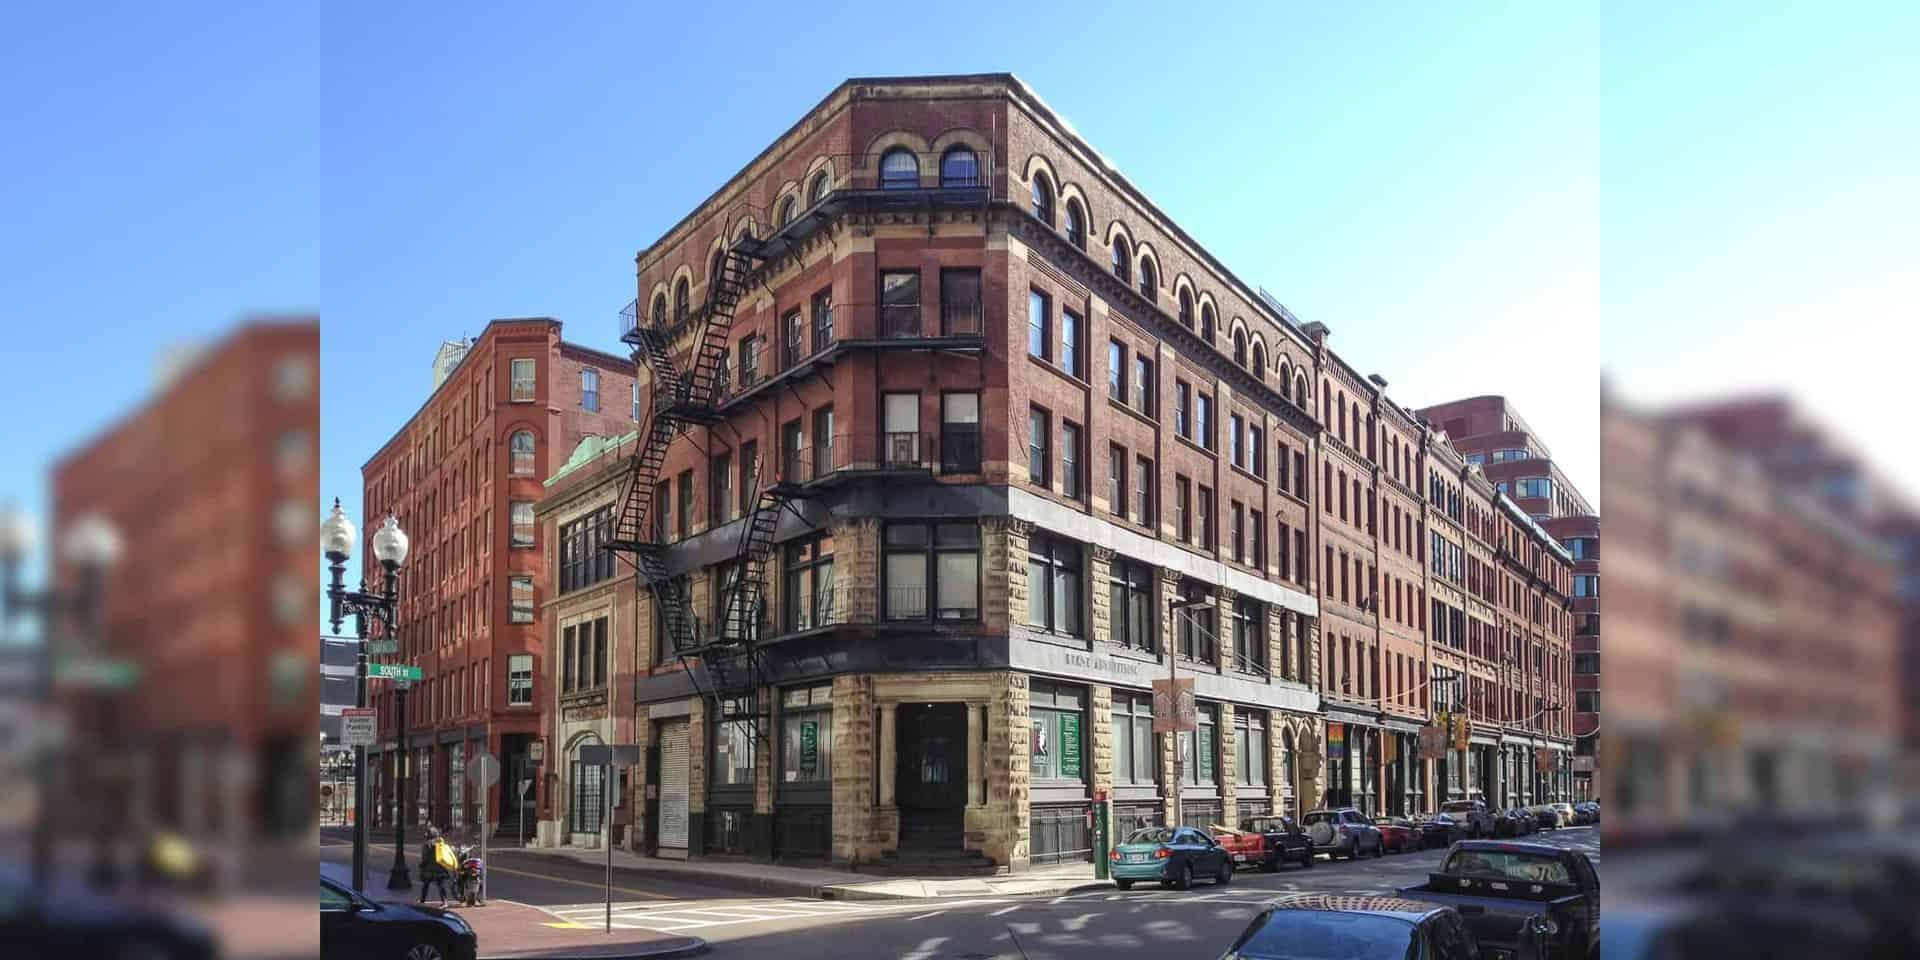 86 South Street Lofts